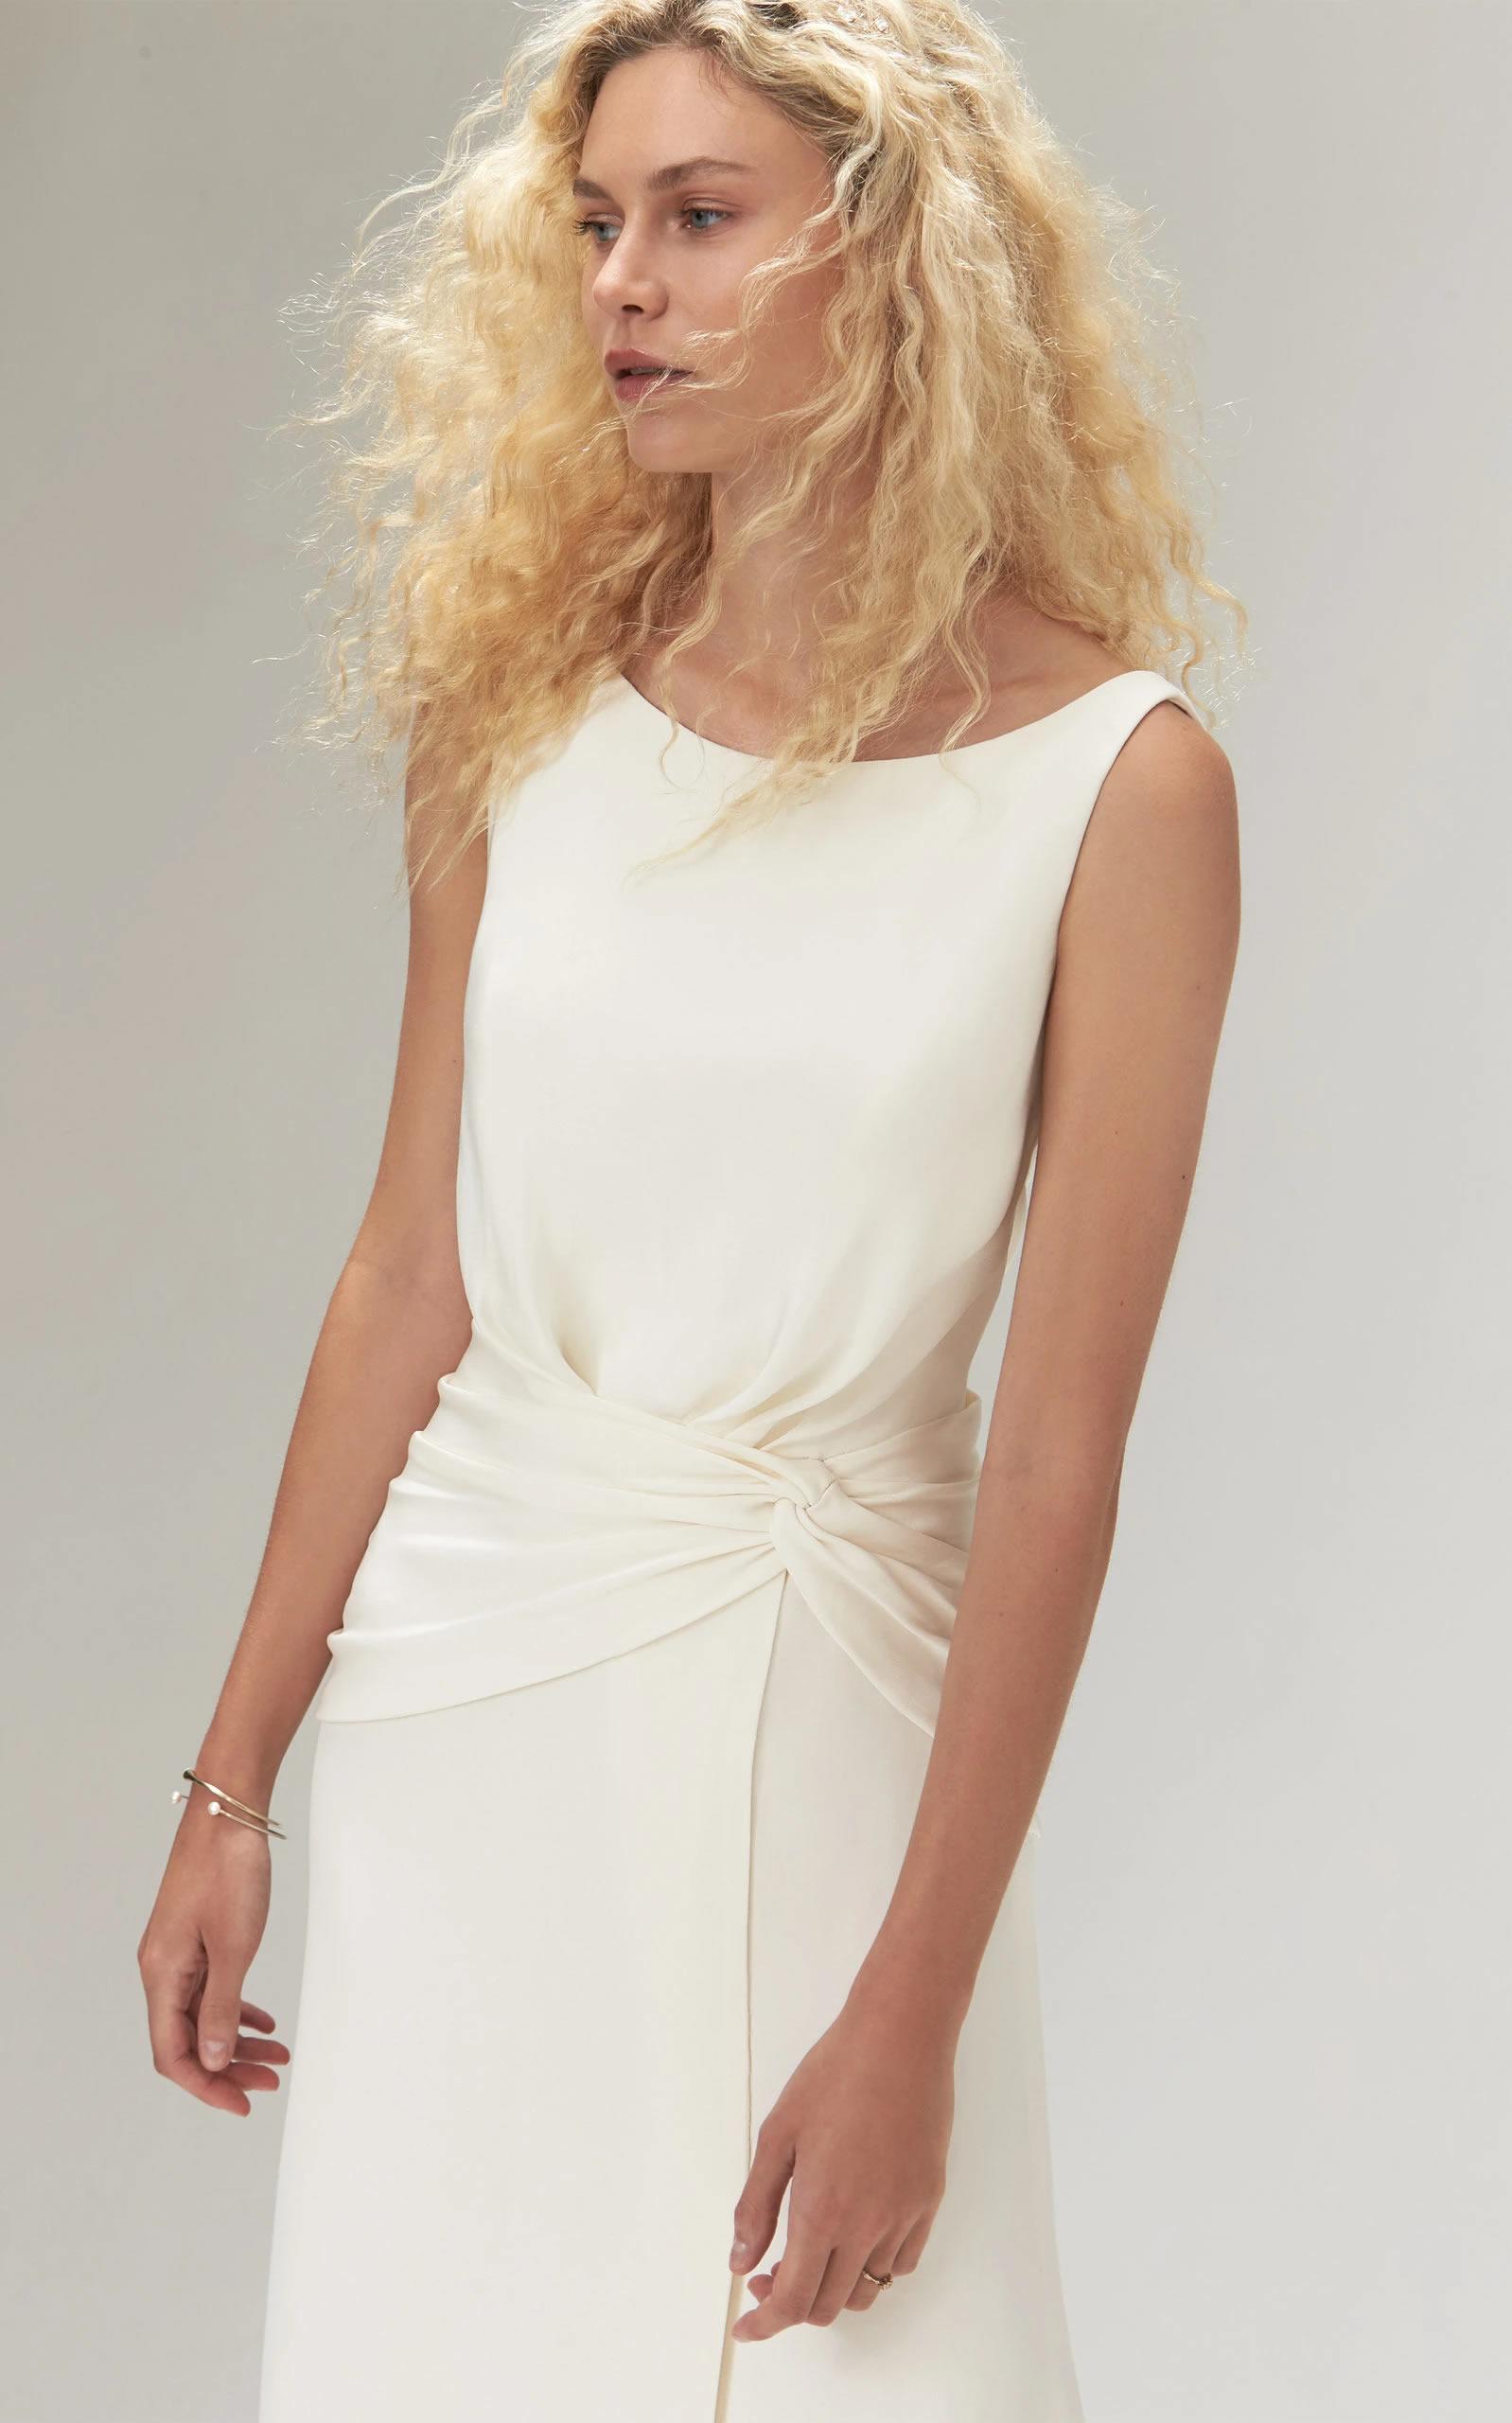 Savannah Miller - Amadine Crepe Plunging Back Gown With Side Split